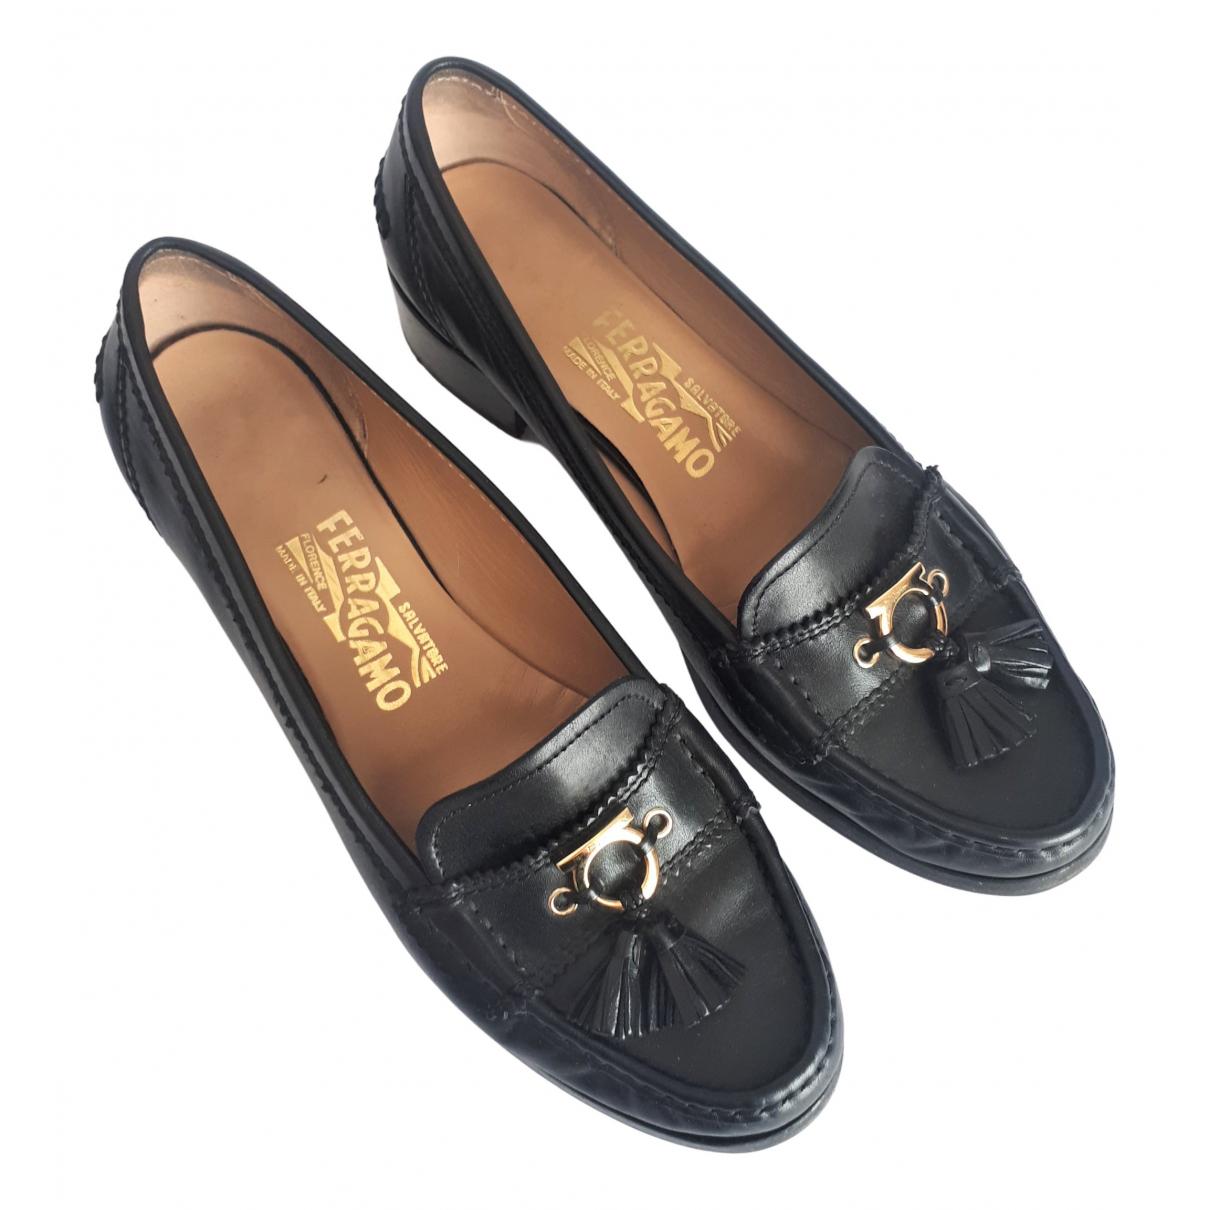 Salvatore Ferragamo \N Black Leather Heels for Women 8 US